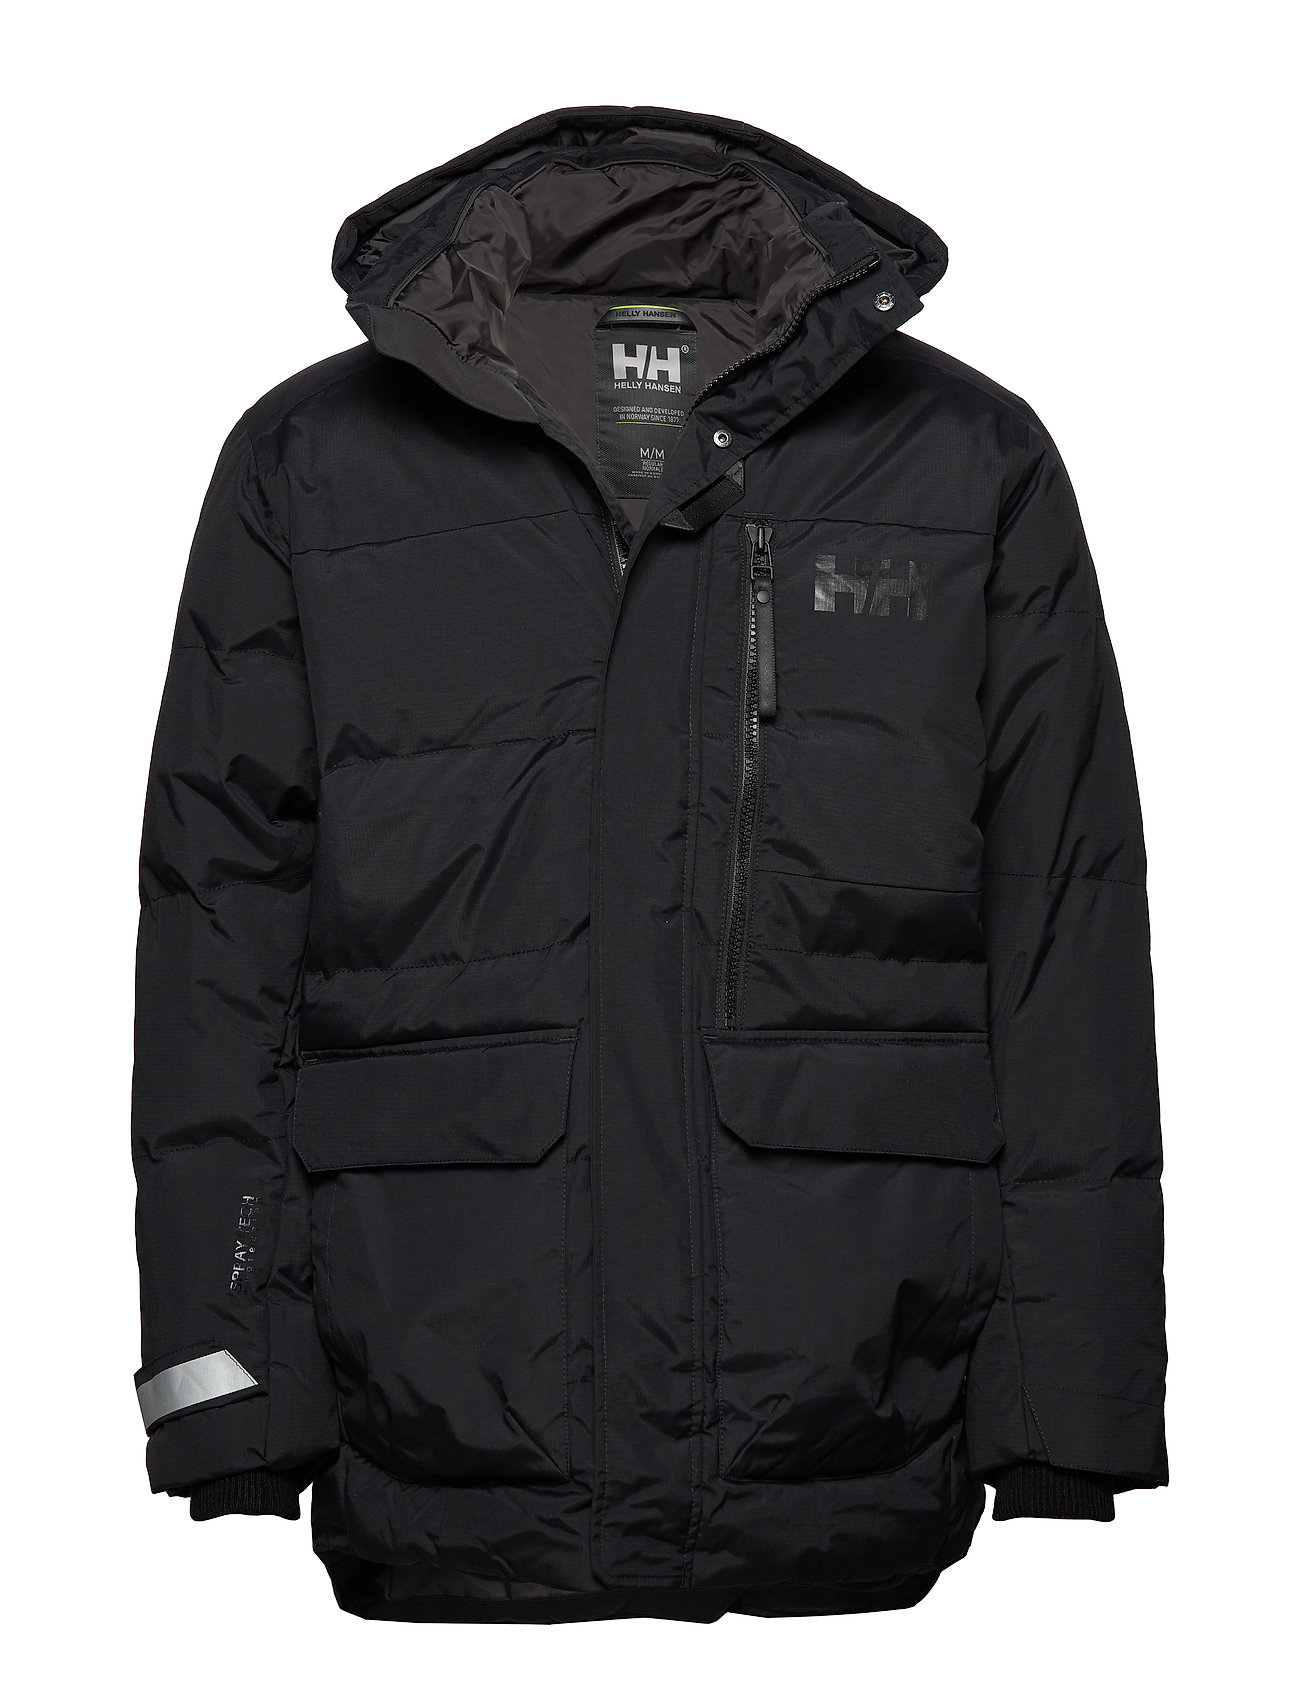 HELLY HANSEN Tromsoe Jacket Parka Jacke Schwarz HELLY HANSEN